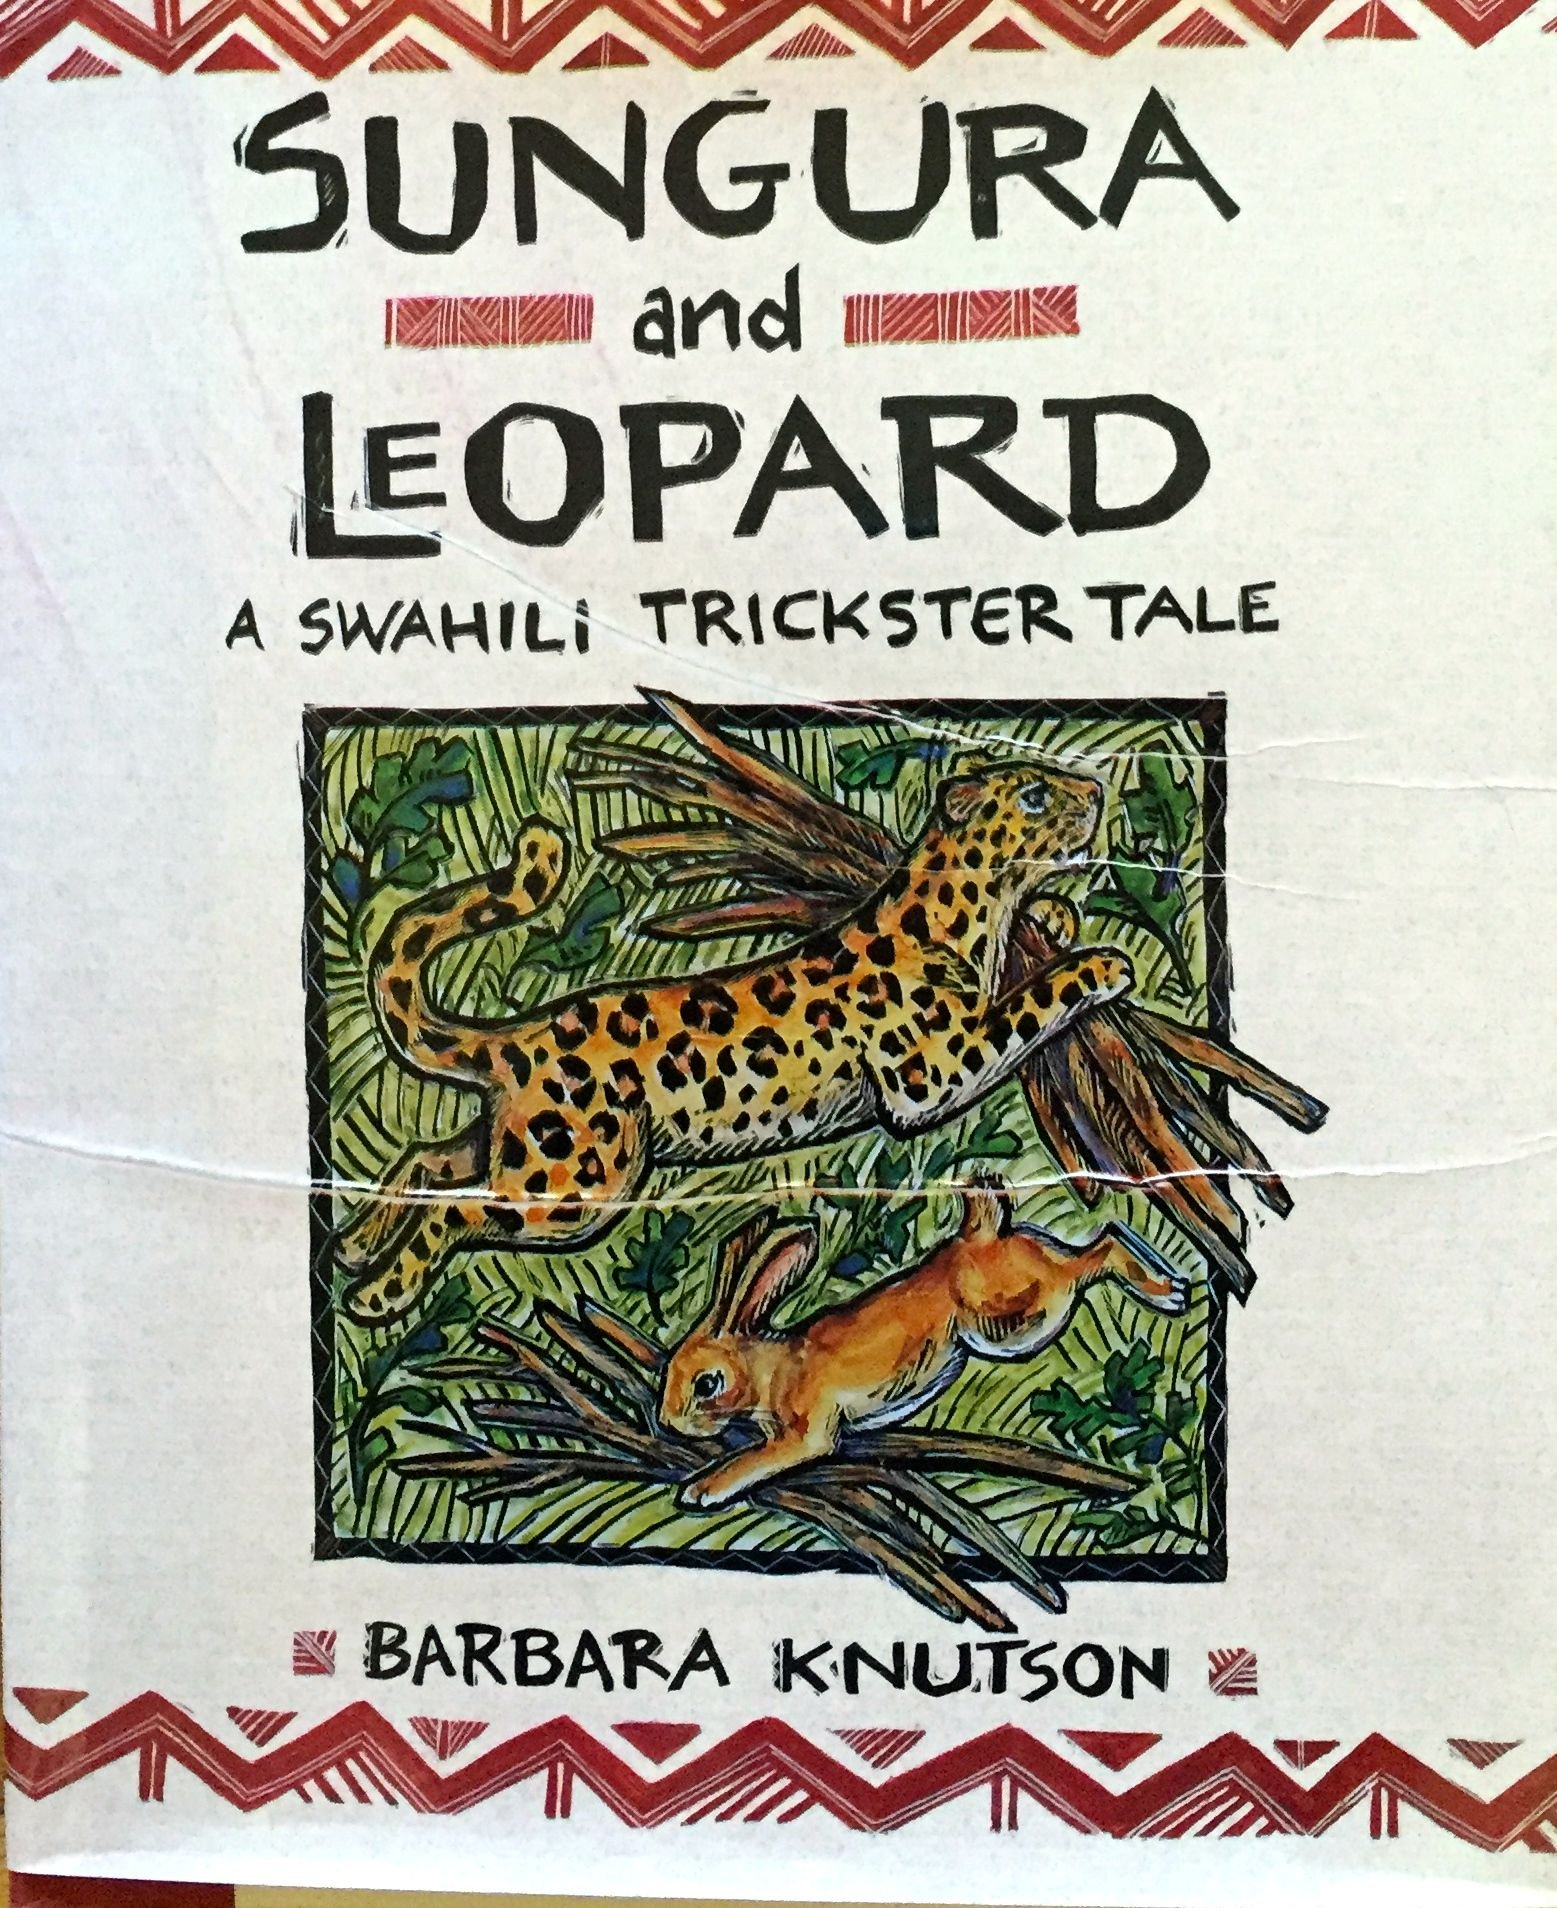 Sungura and Leopard: A Swahili Trickster Tale